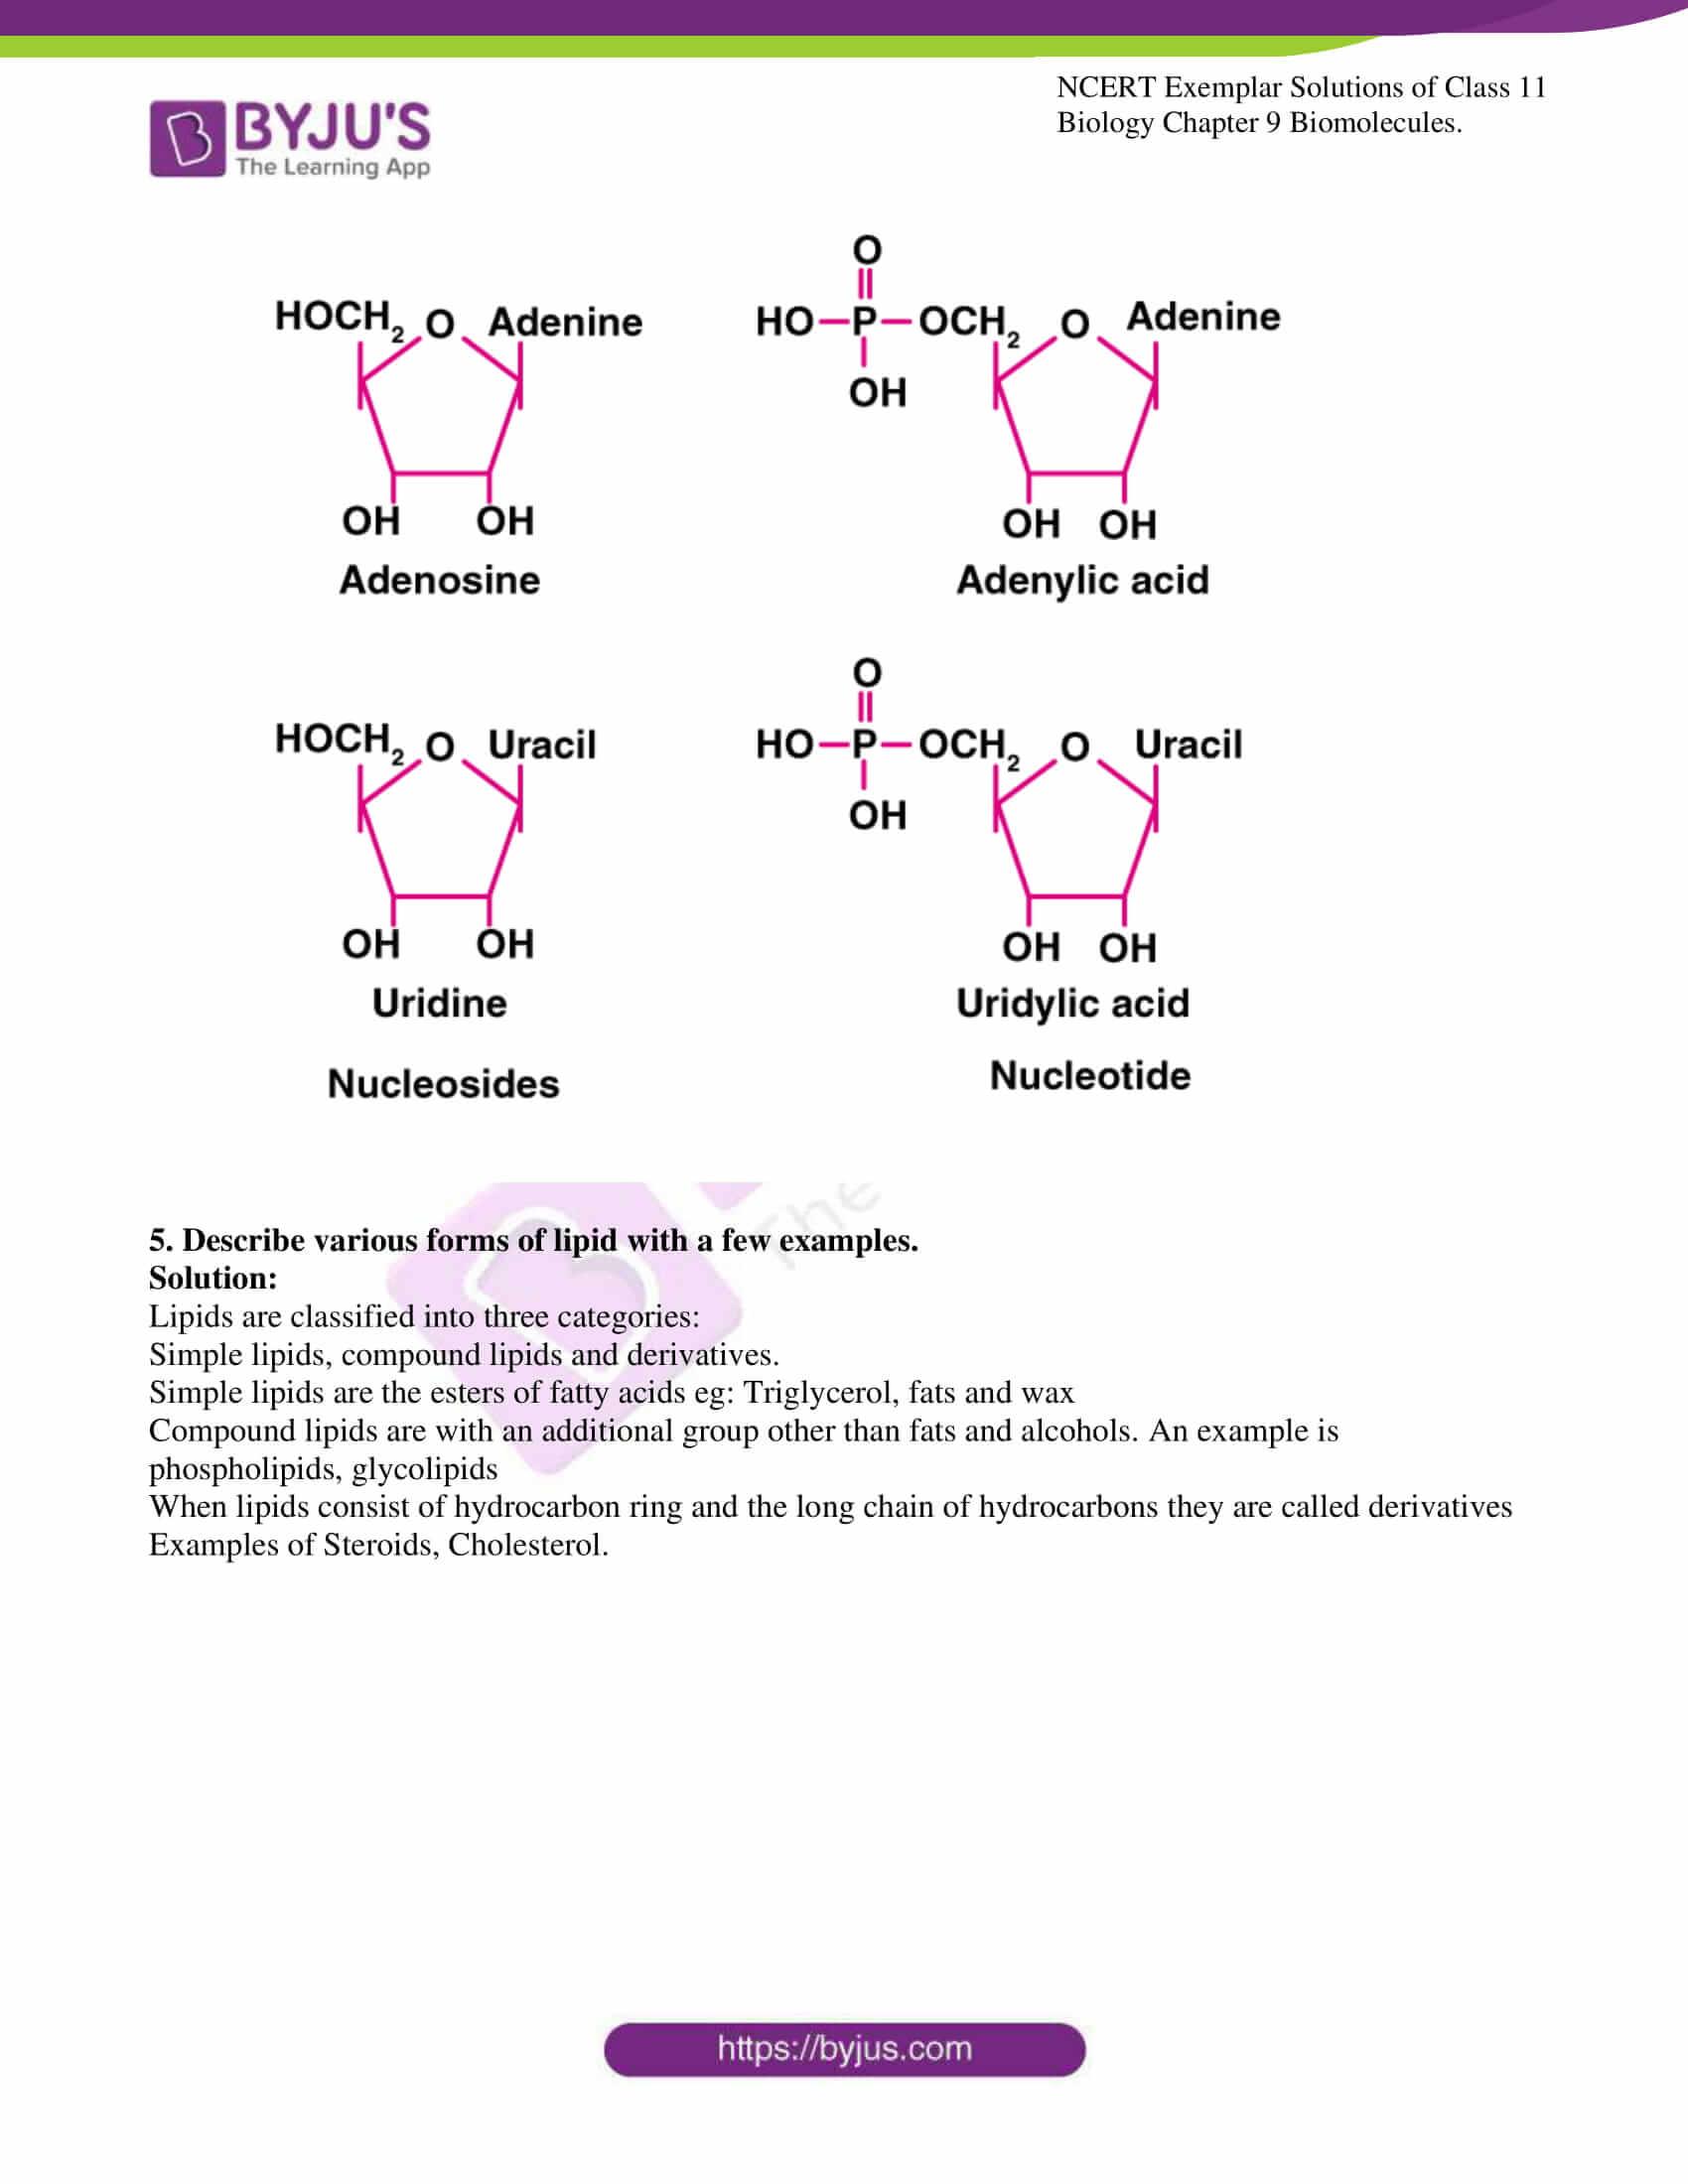 ncert exemplar solutions for class 11 bio chapter 9 9